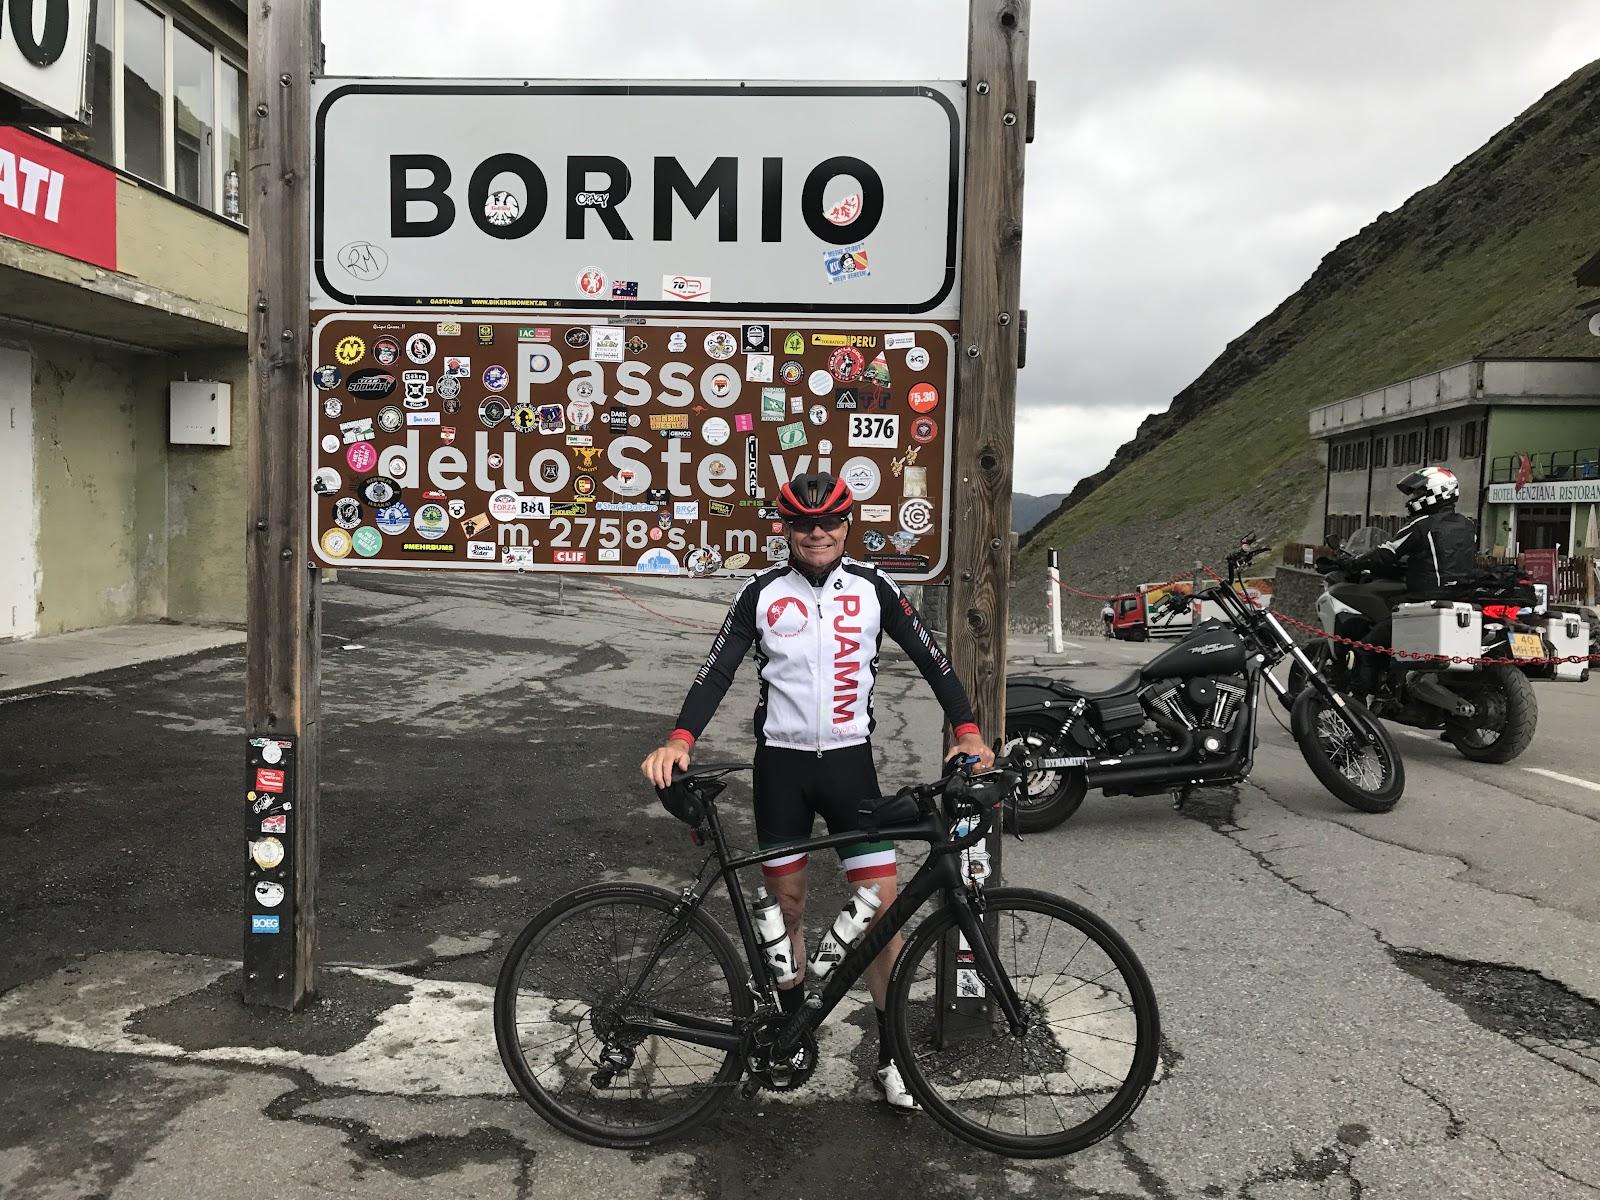 Bike climb Passo dello Stelvio - John Johnson PJAMM Cycling at pass sign with bicycle